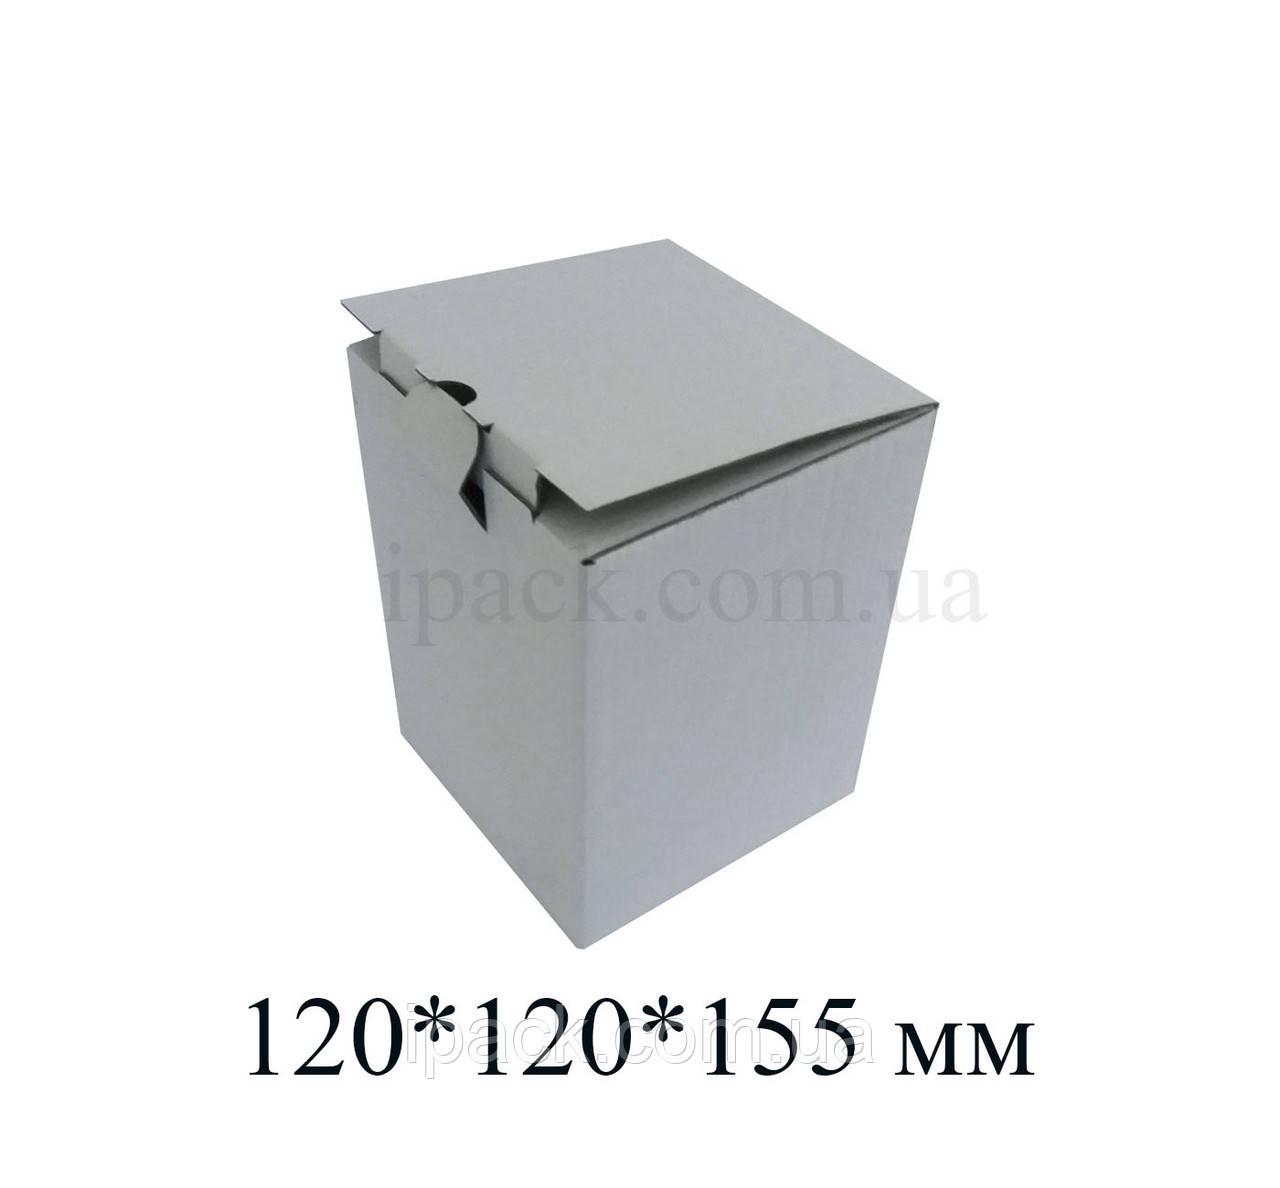 Коробка картонная самосборная, 120*120*155, мм, белая, микрогофрокартон